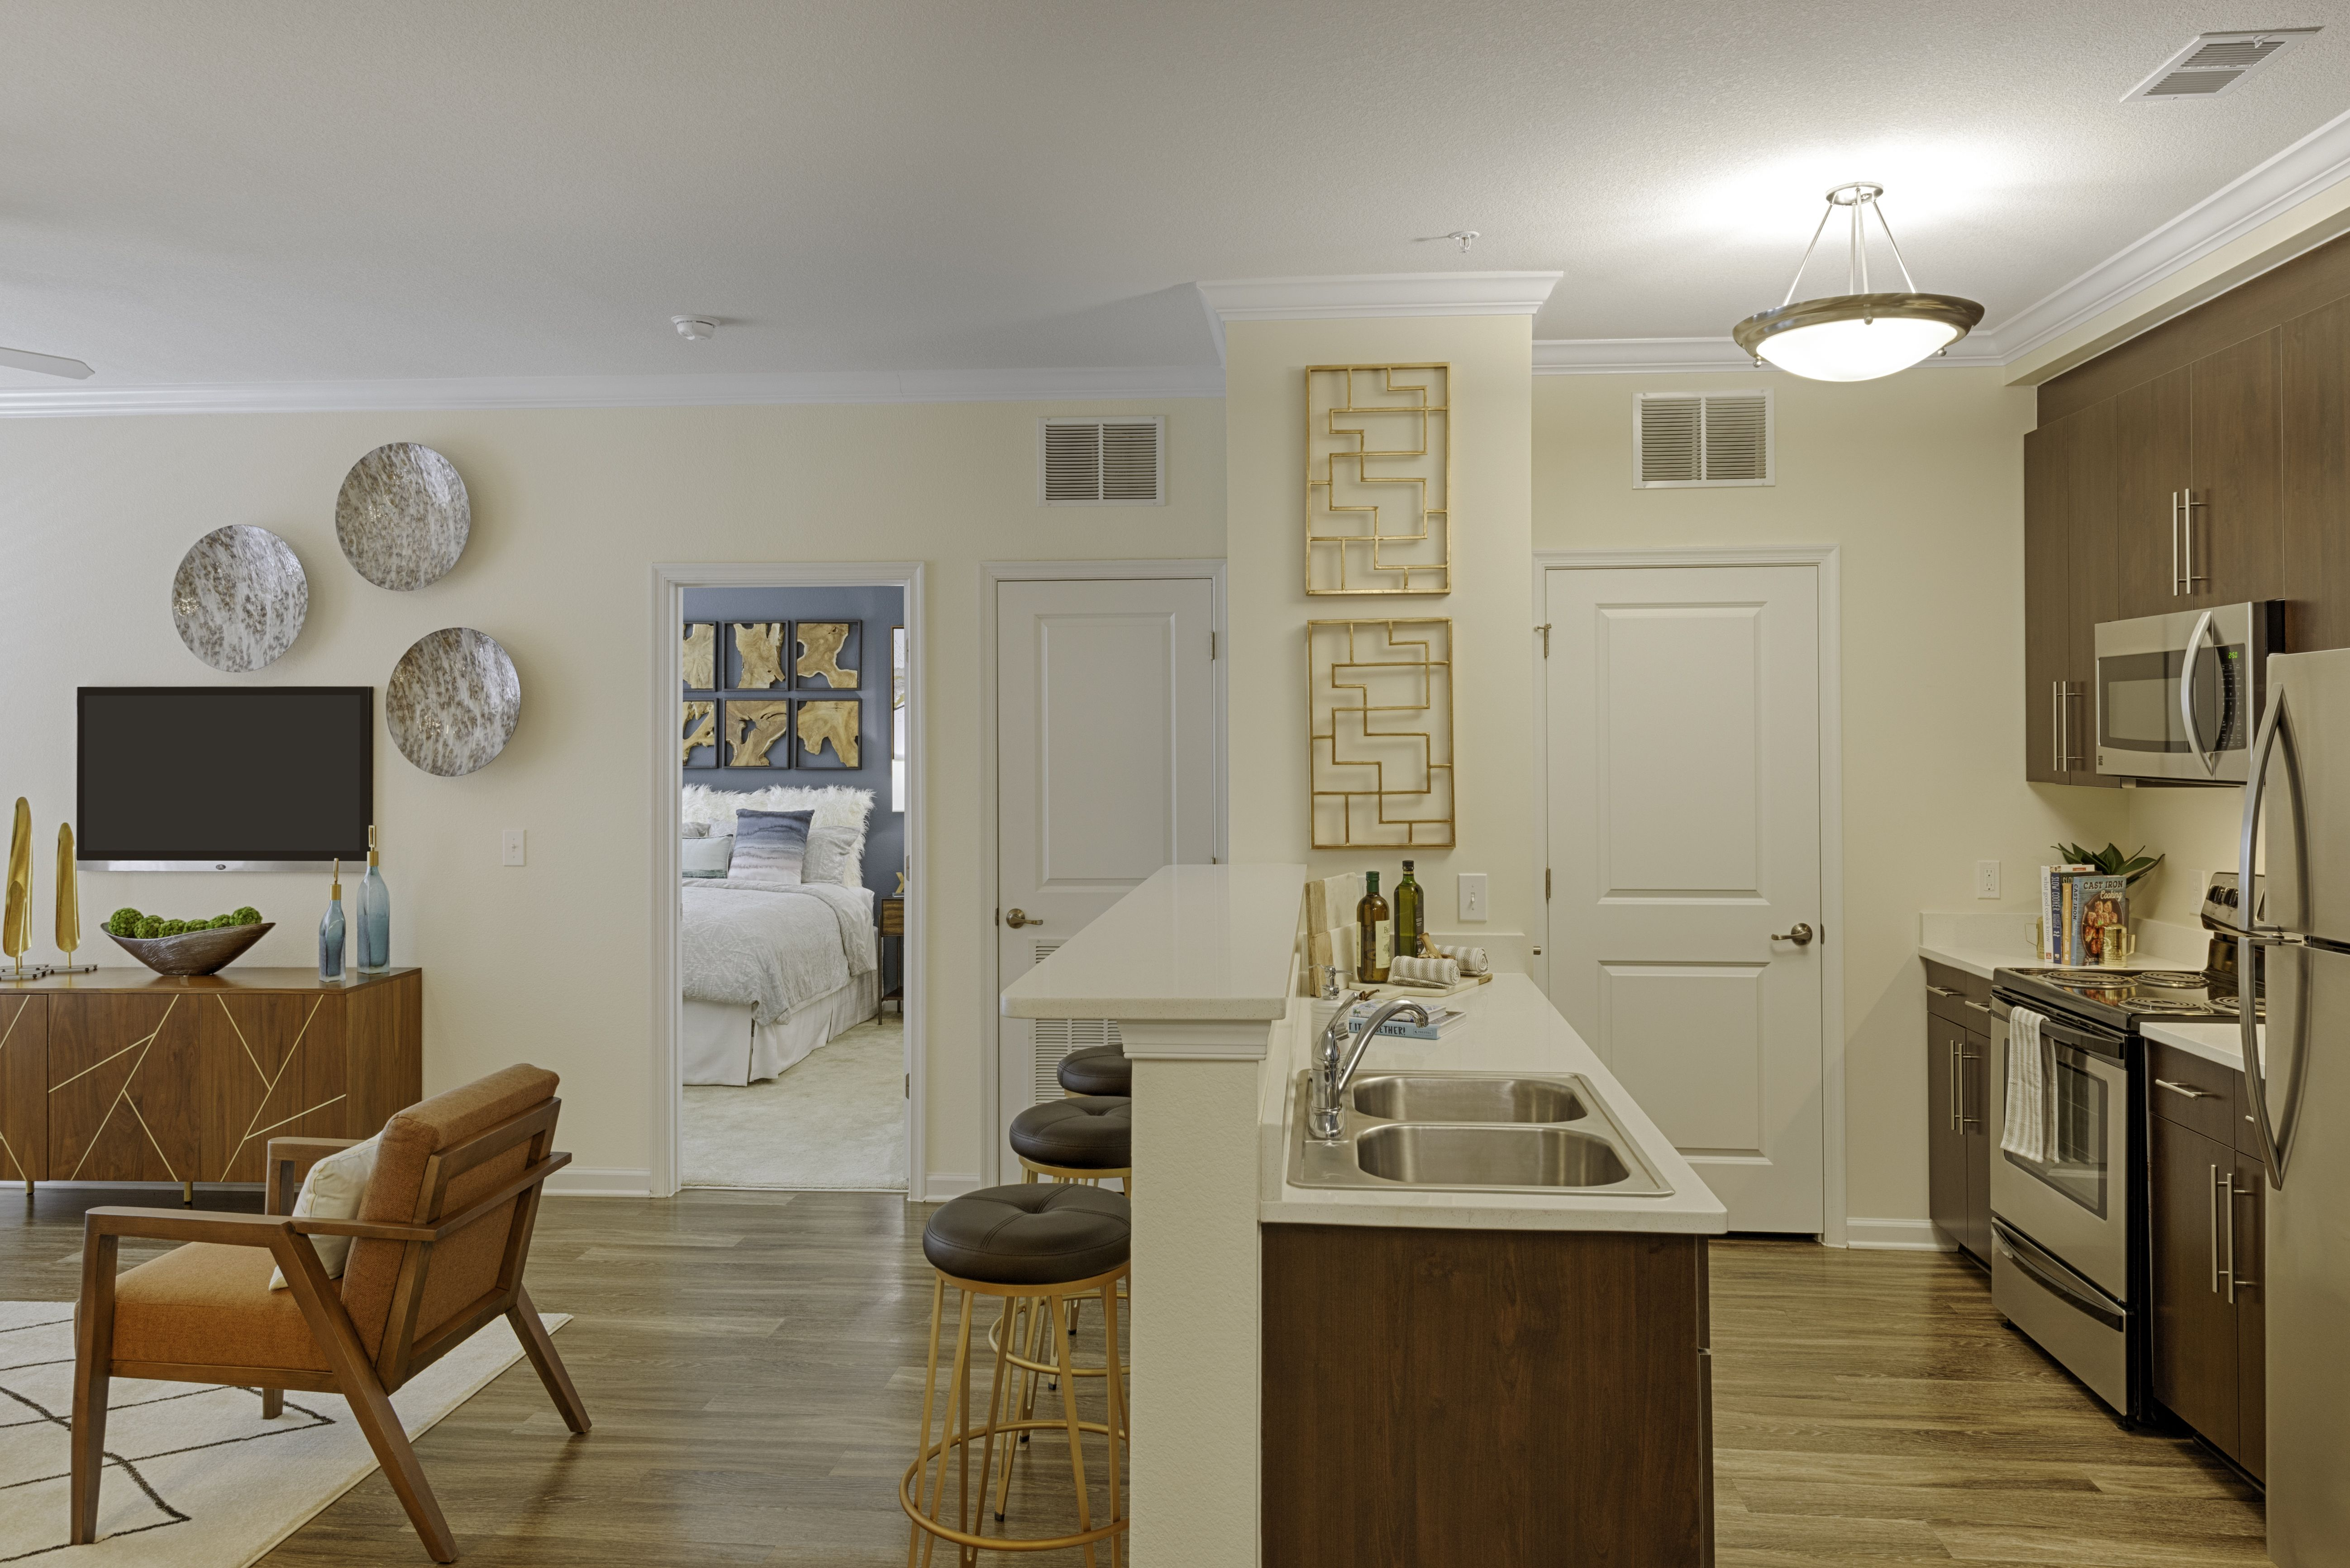 877 635 0184 1 3 Bedroom 1 2 Bath The Carlton At Greenbrier Apartments 1501 Carlton Drive Chesapeake Va 23320 Apartments For Rent Apartment Home